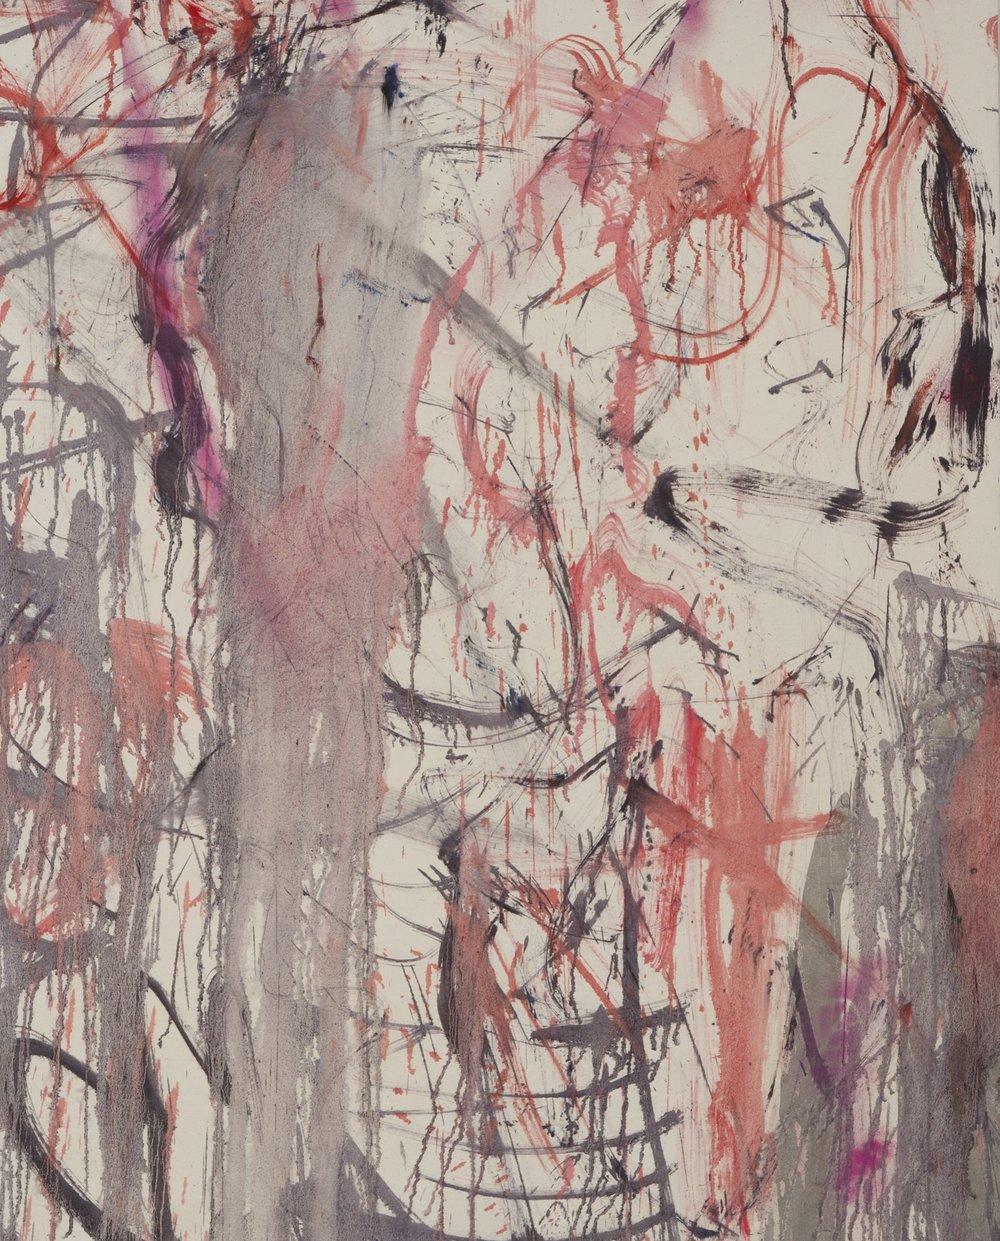 Oil on canvas/160x130cm 2017